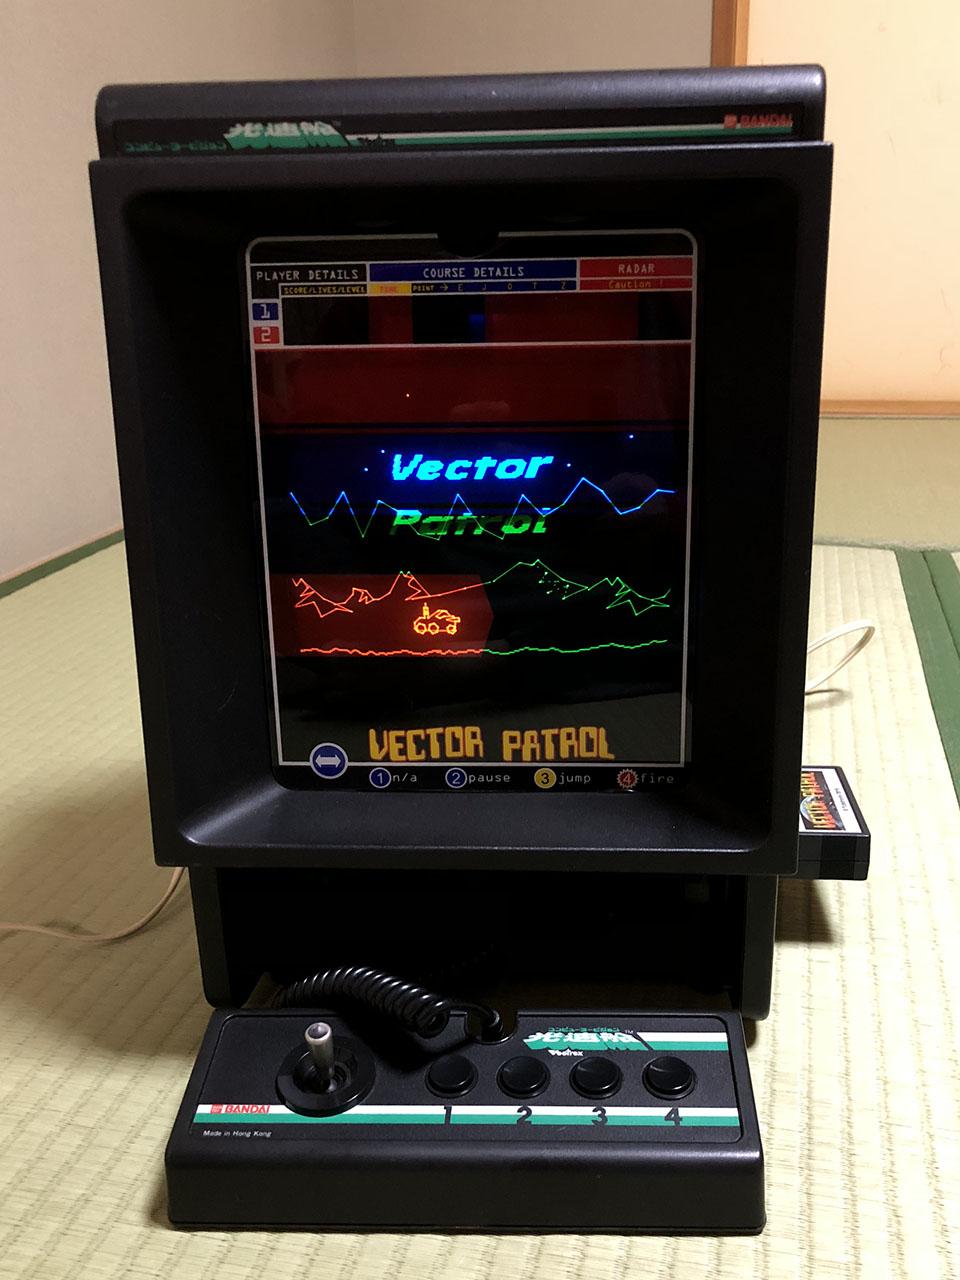 okaz::だめにっき「光速船(Vectrex)」カテゴリーアーカイブ[Vectrex/光速船」小型プロトタイプ発見![光速船/Vectrex]発売35周年[Vectrex/光速船]Vector Patrol(Moon Patrol)[ベクタースキャン]Ocelot Arcade System[ベクタースキャン]ZEKTOR ZVGについて色々とATARI Major Havoc Machine(TEMPEST Conversion Ver.)[光速船/Vectrex]負け組ハード烈伝[光速船/Vectrex]コインオペ光速船みたび[光速船/Vectrex]ヤフオクにてコインオペ版光速船出品中[Vectrex/光速船]Vectrex32